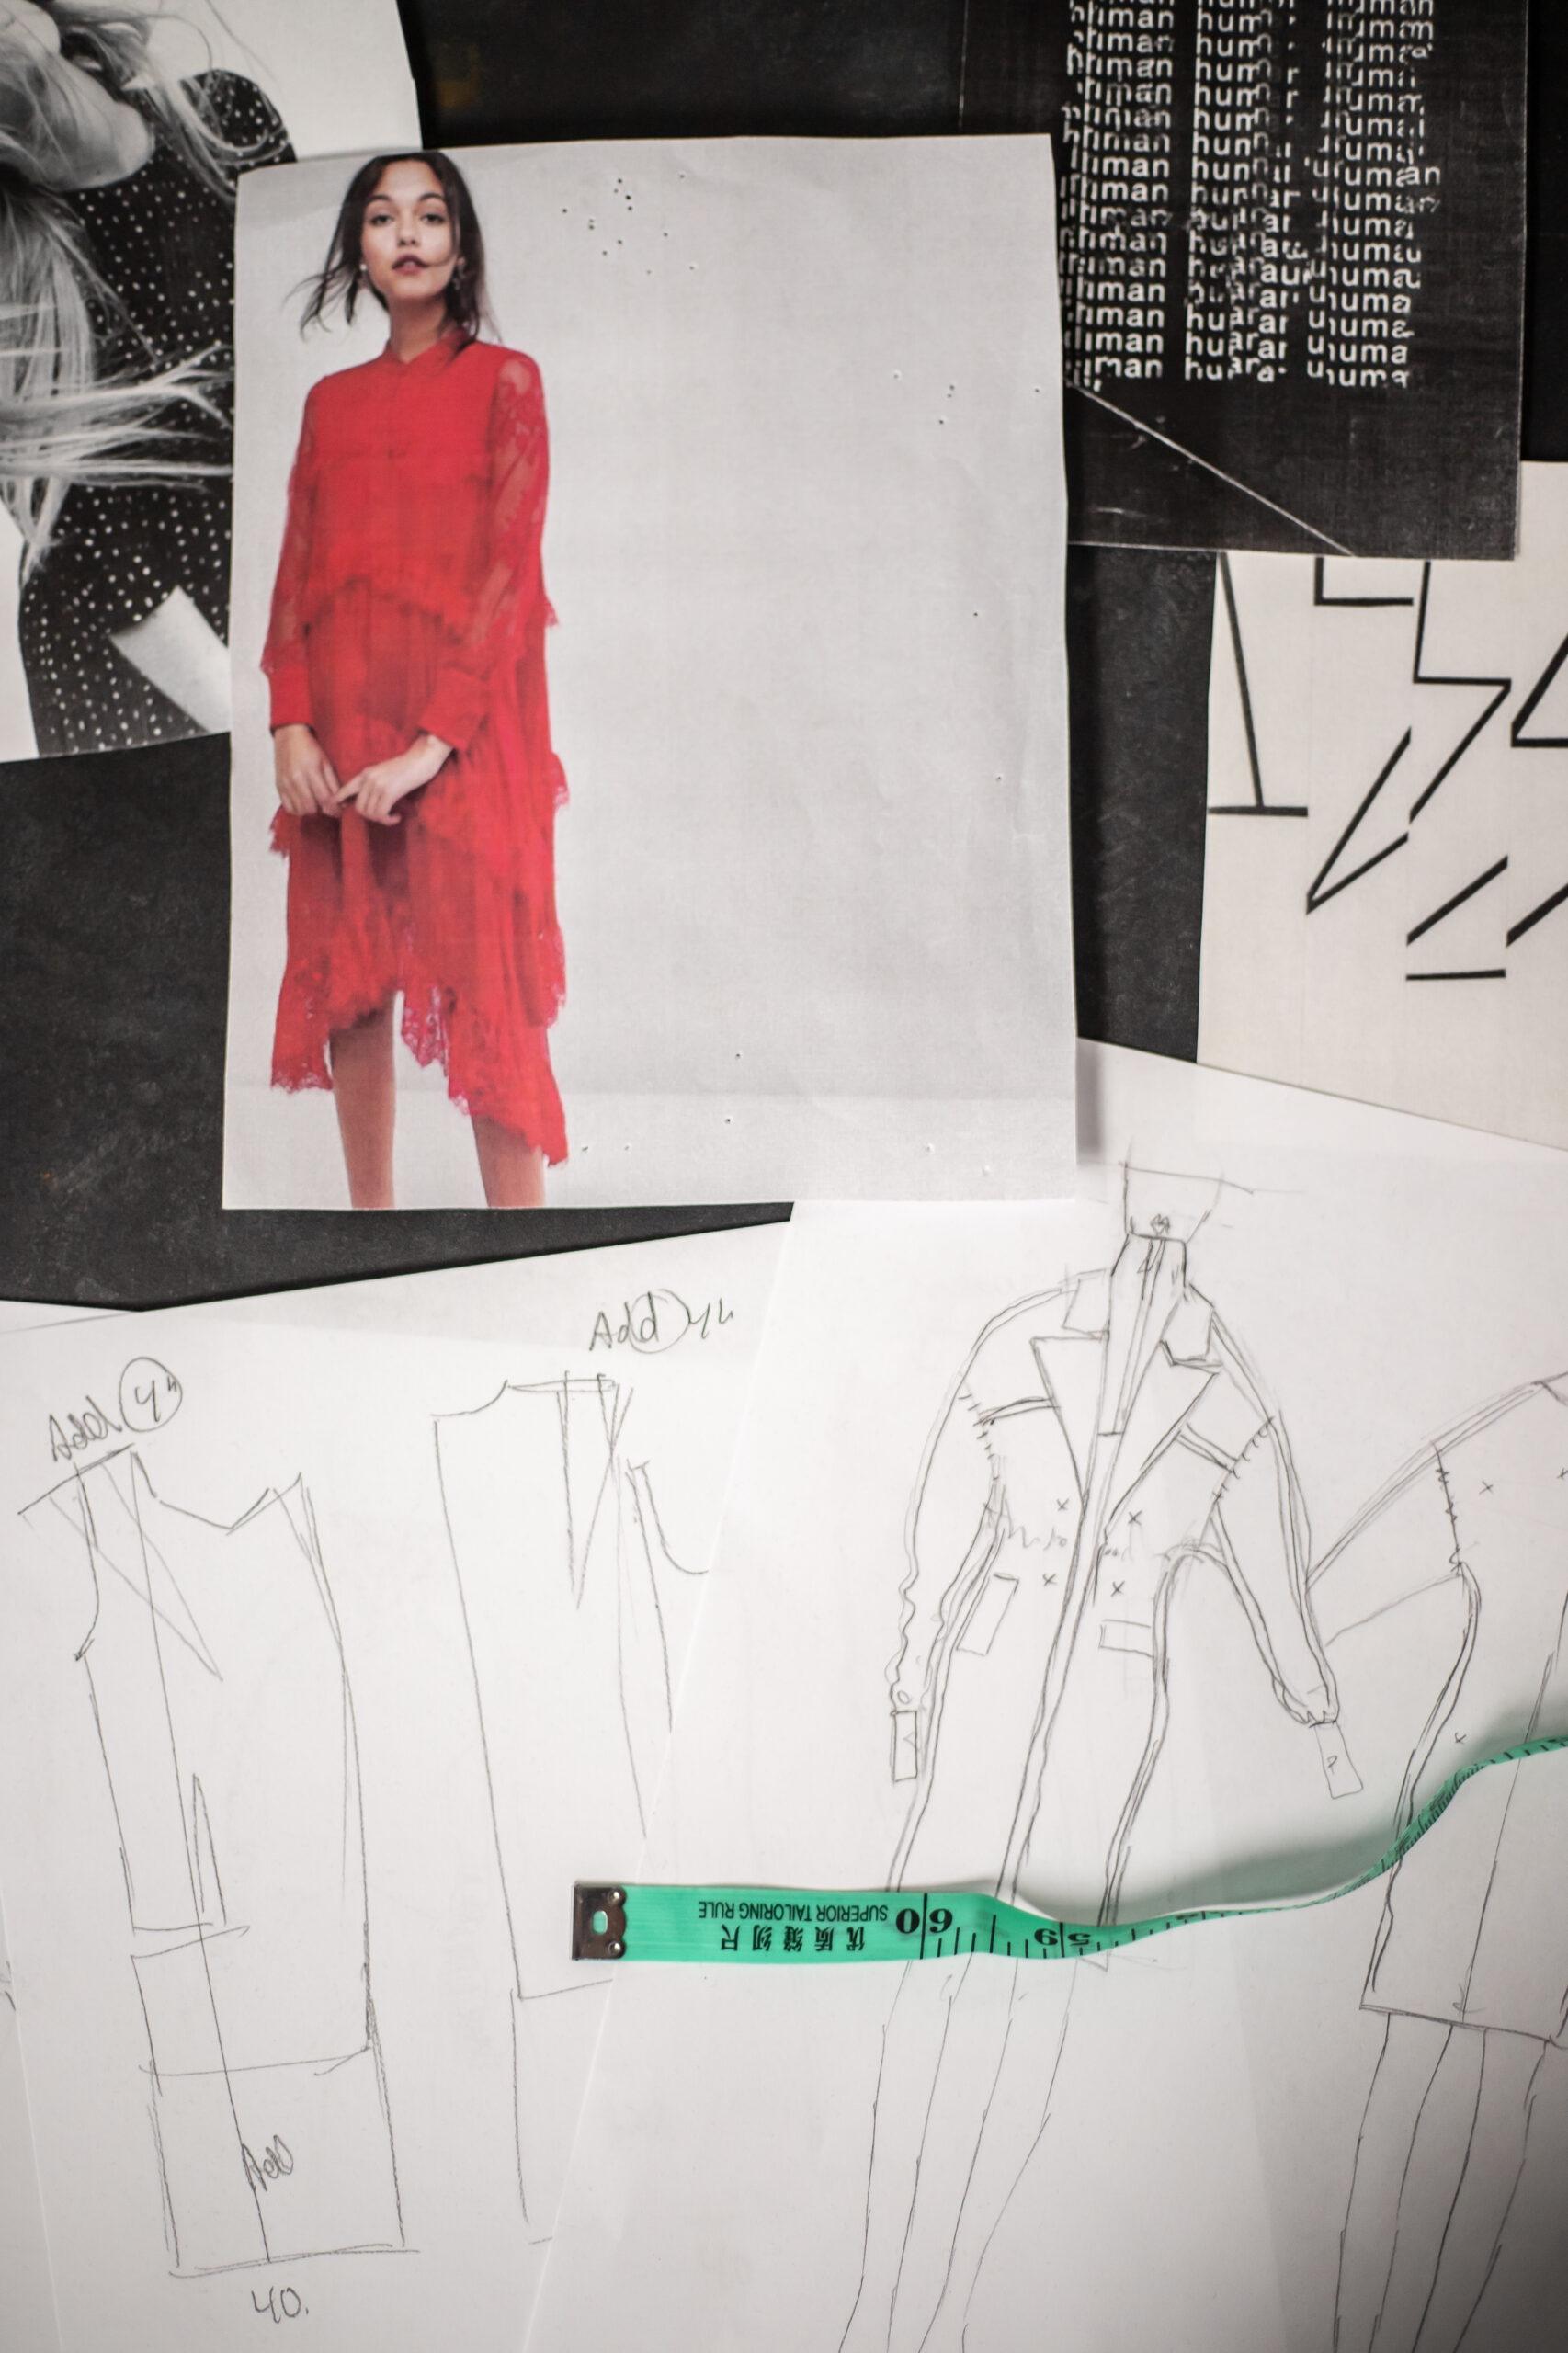 Apparelmark freelance fashion design, based in Vancouver BC